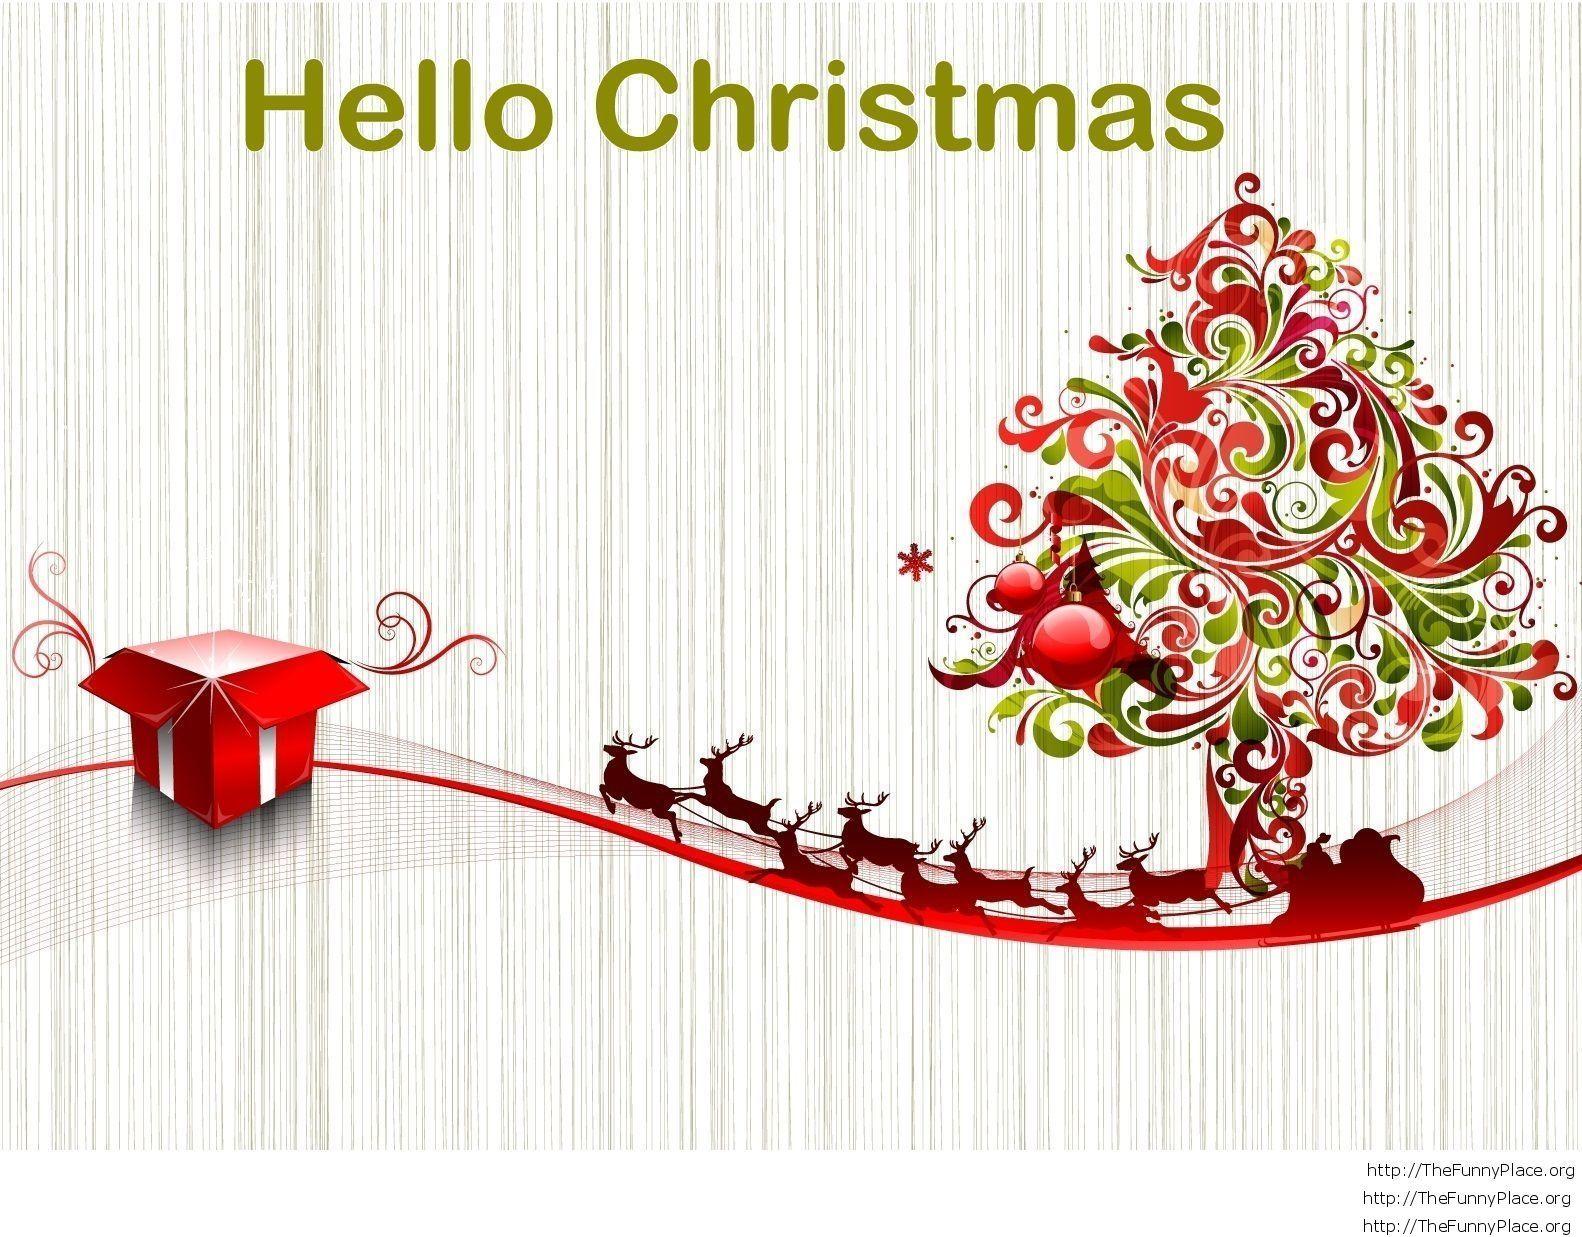 Hello Christmas winter image